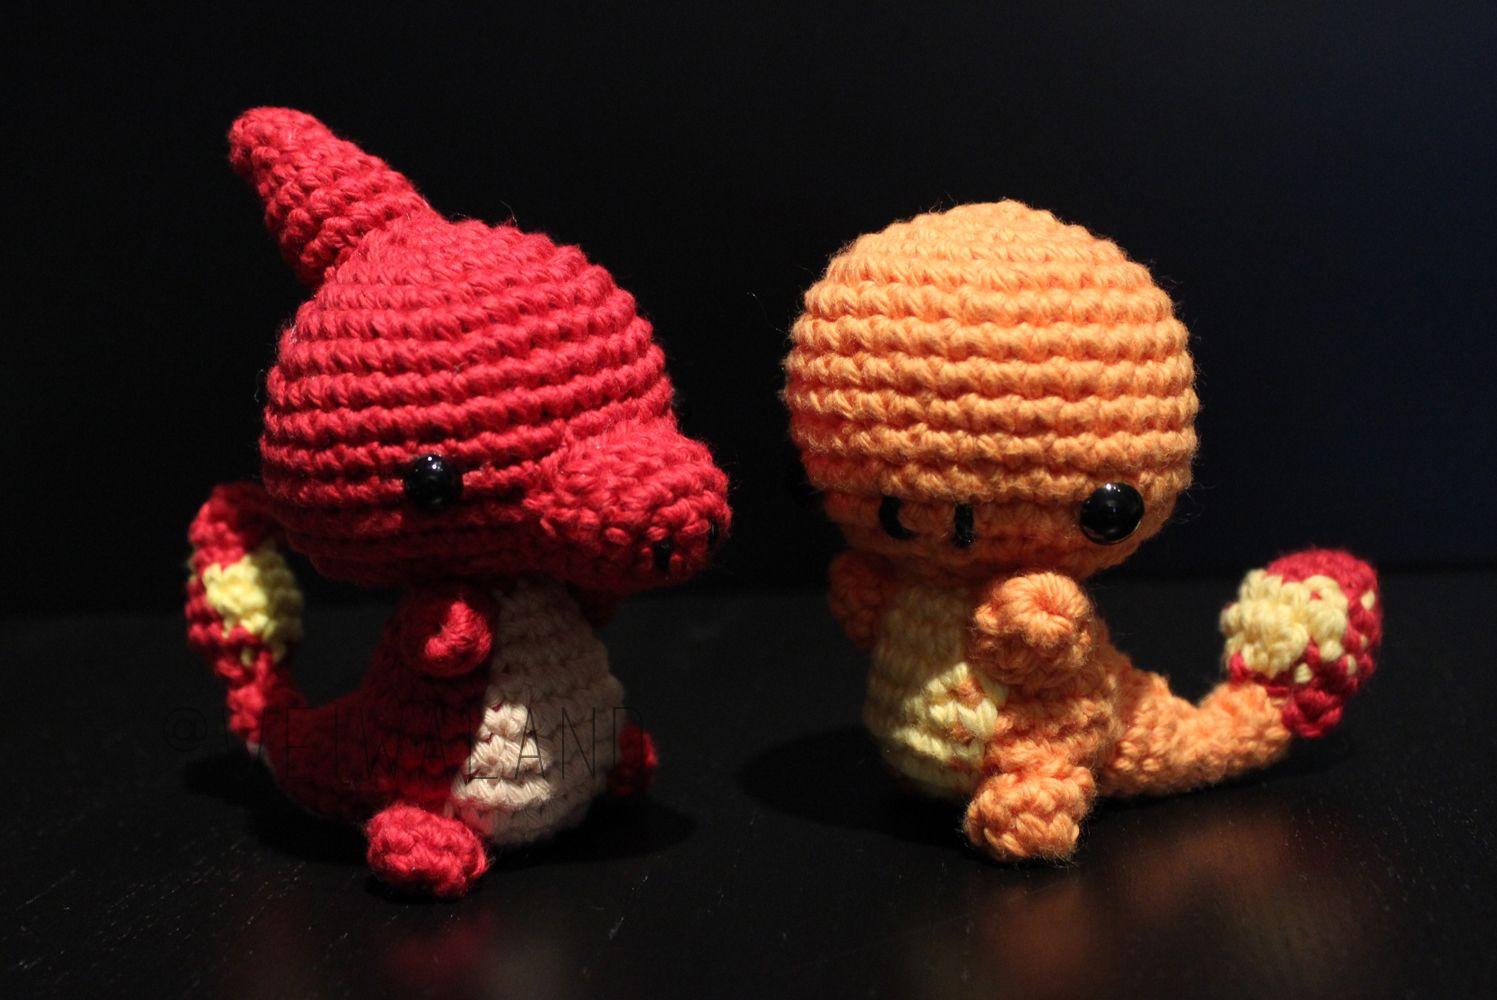 Charmander, Charmeleon; Pokemon | Pokémoni | Pinterest